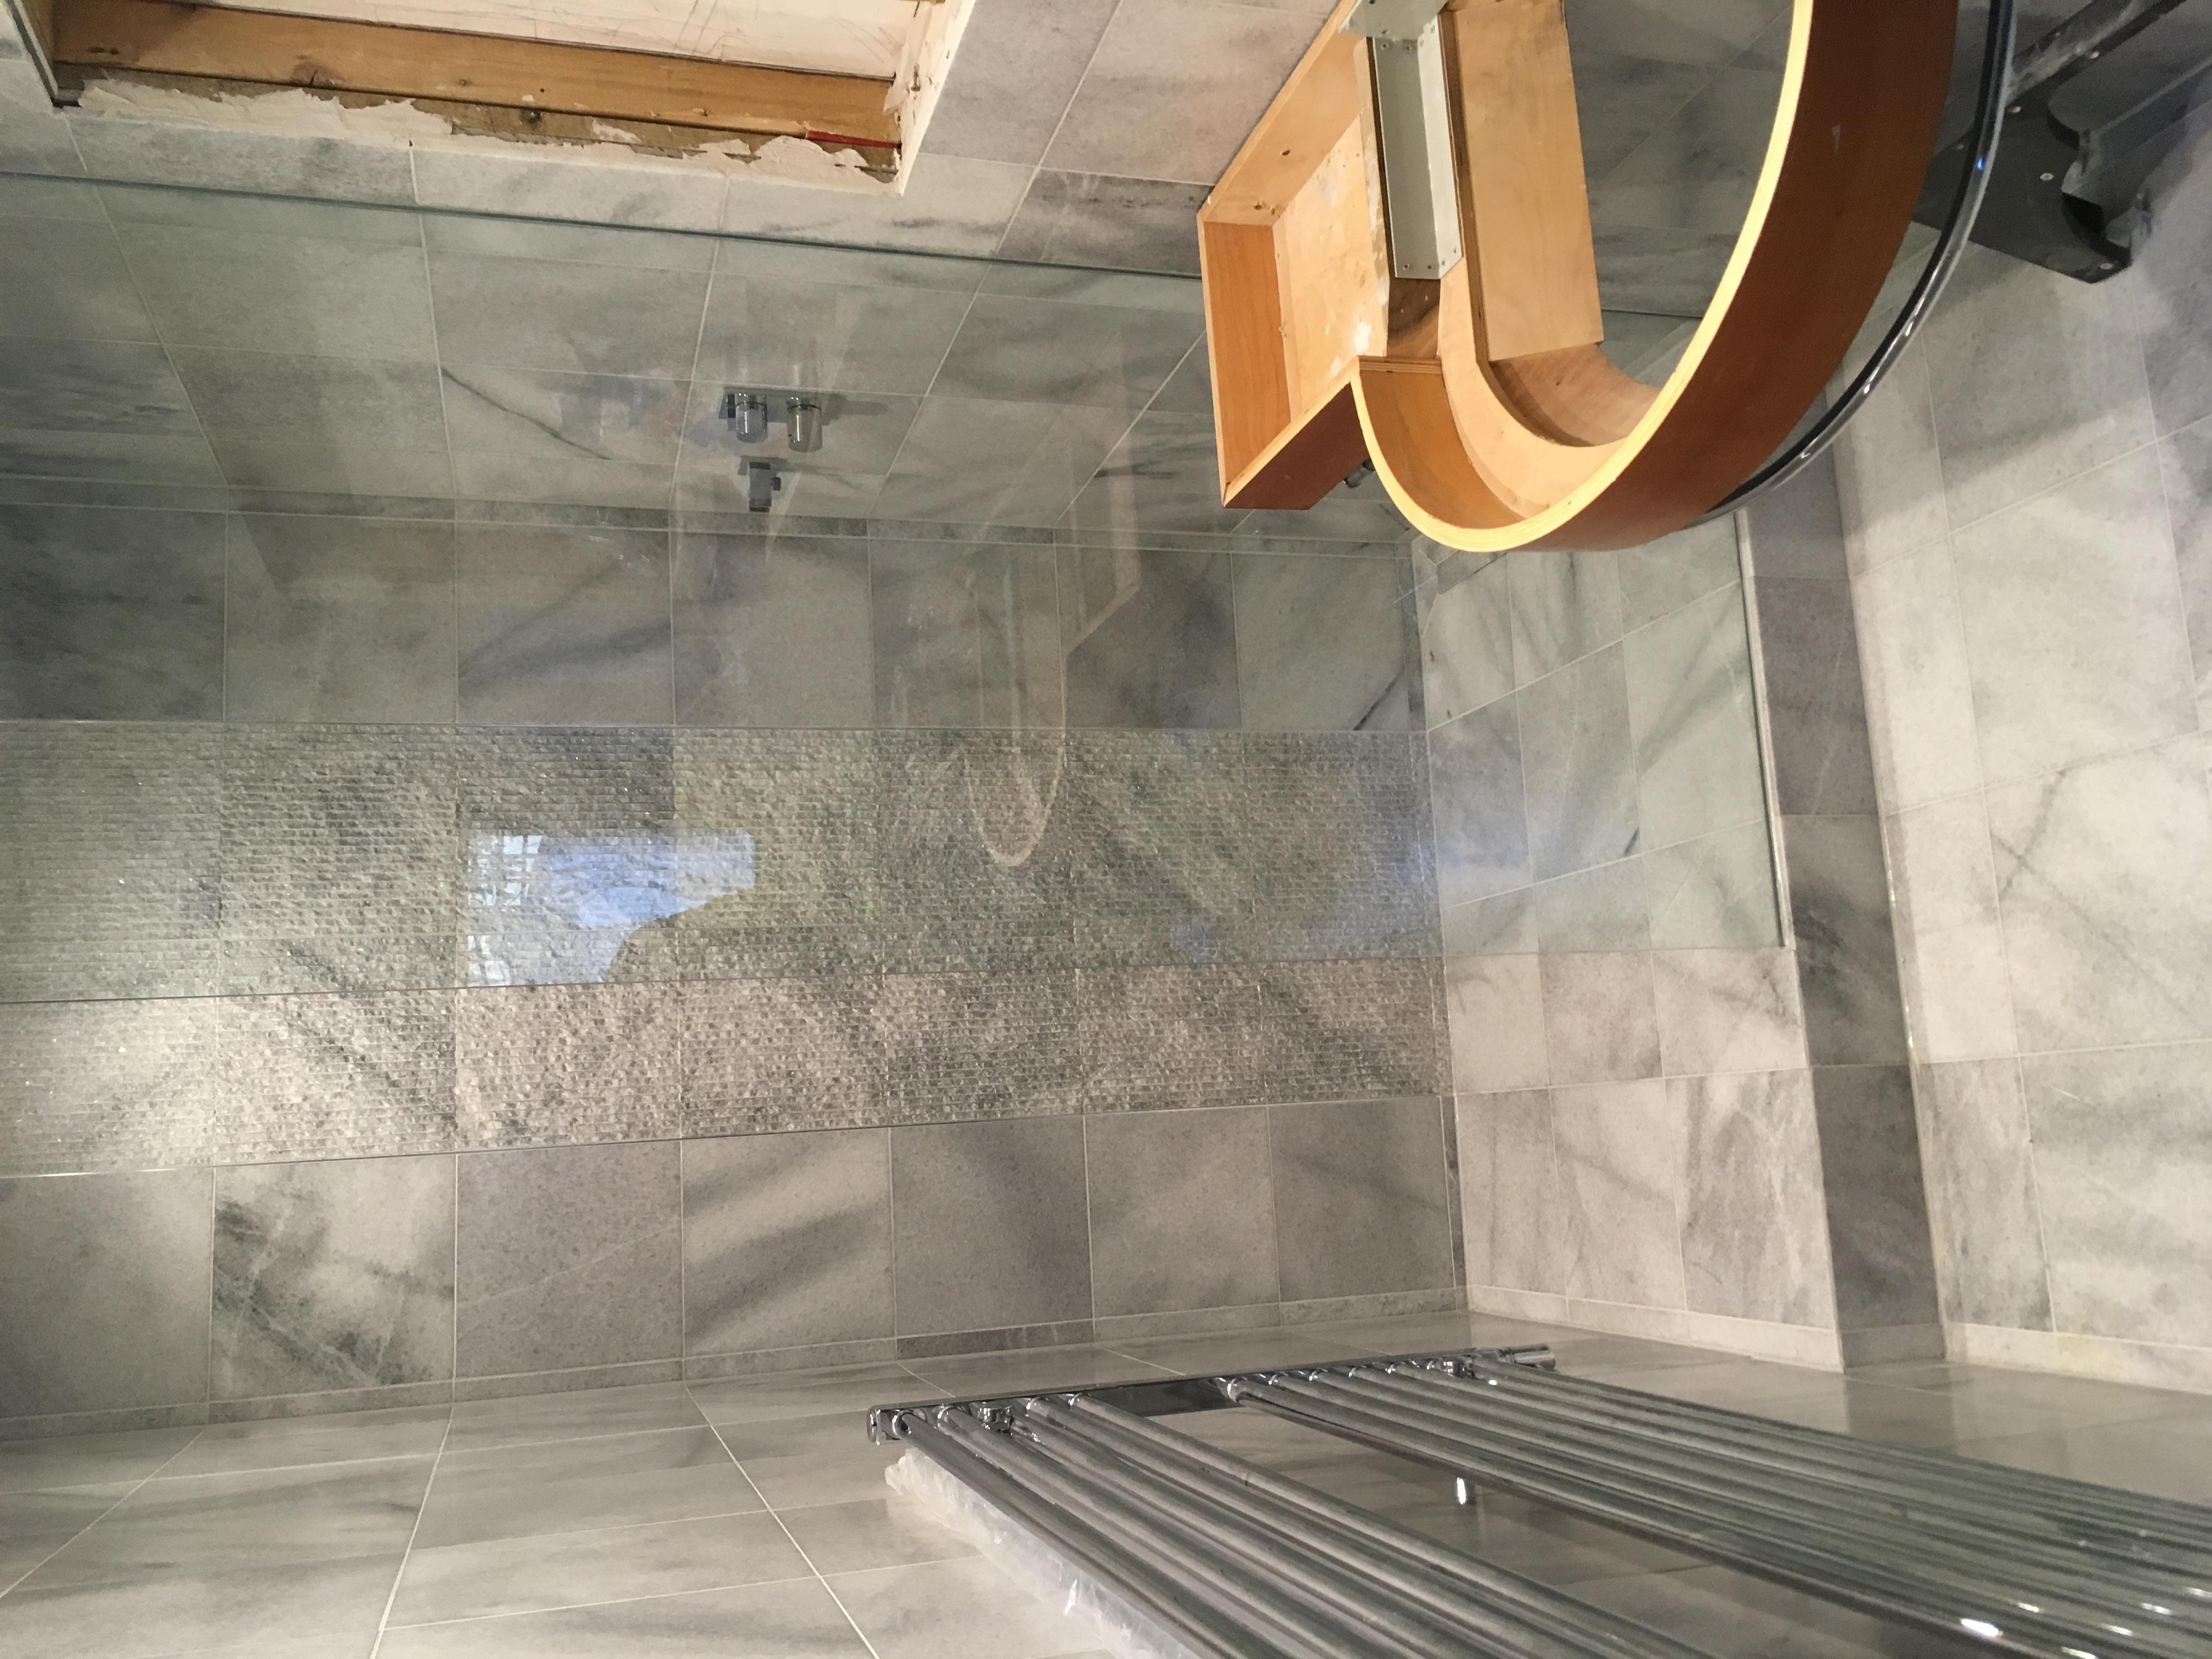 Cristal white marble bathroom tiles (5)